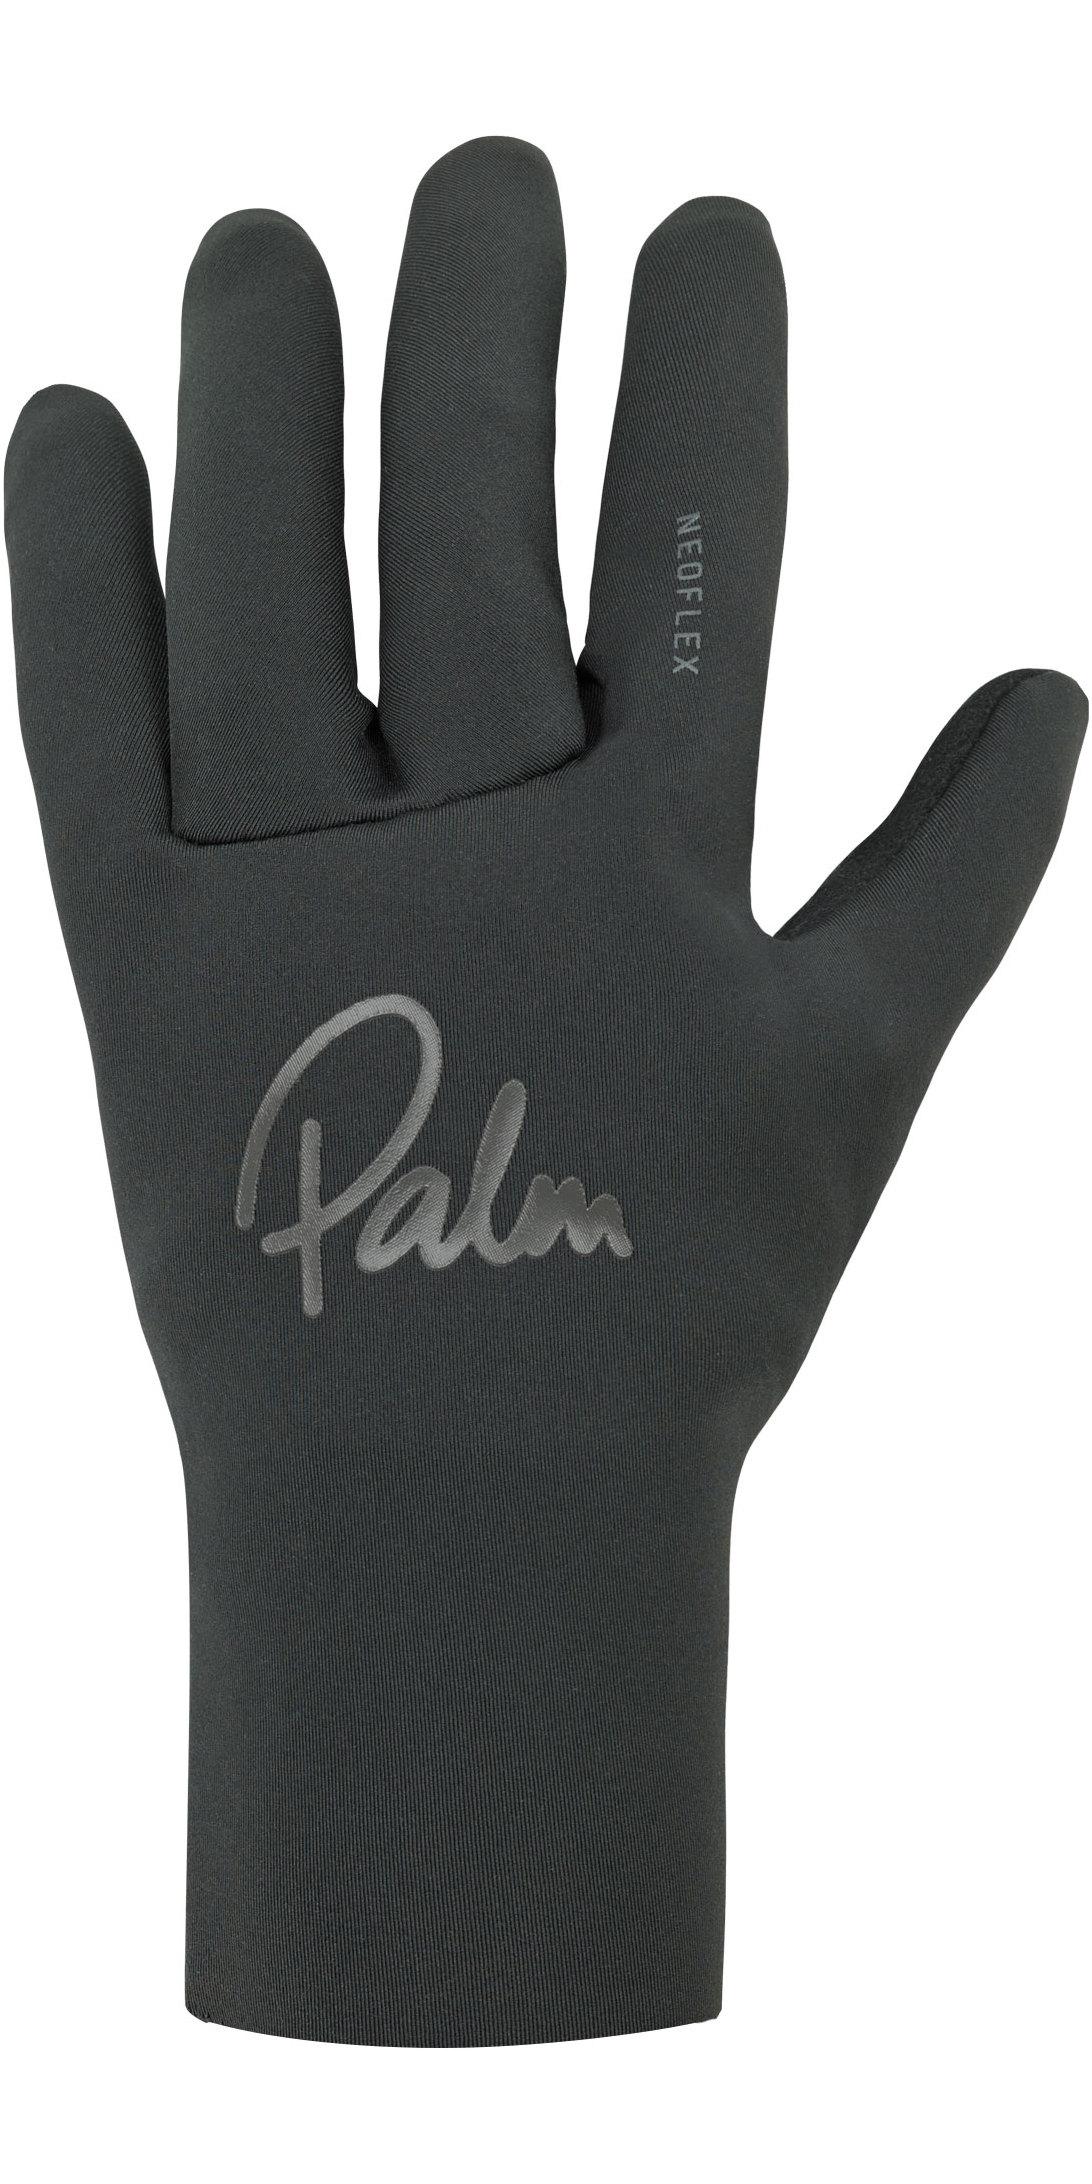 12324 Palm 2020 NeoFlex Gloves